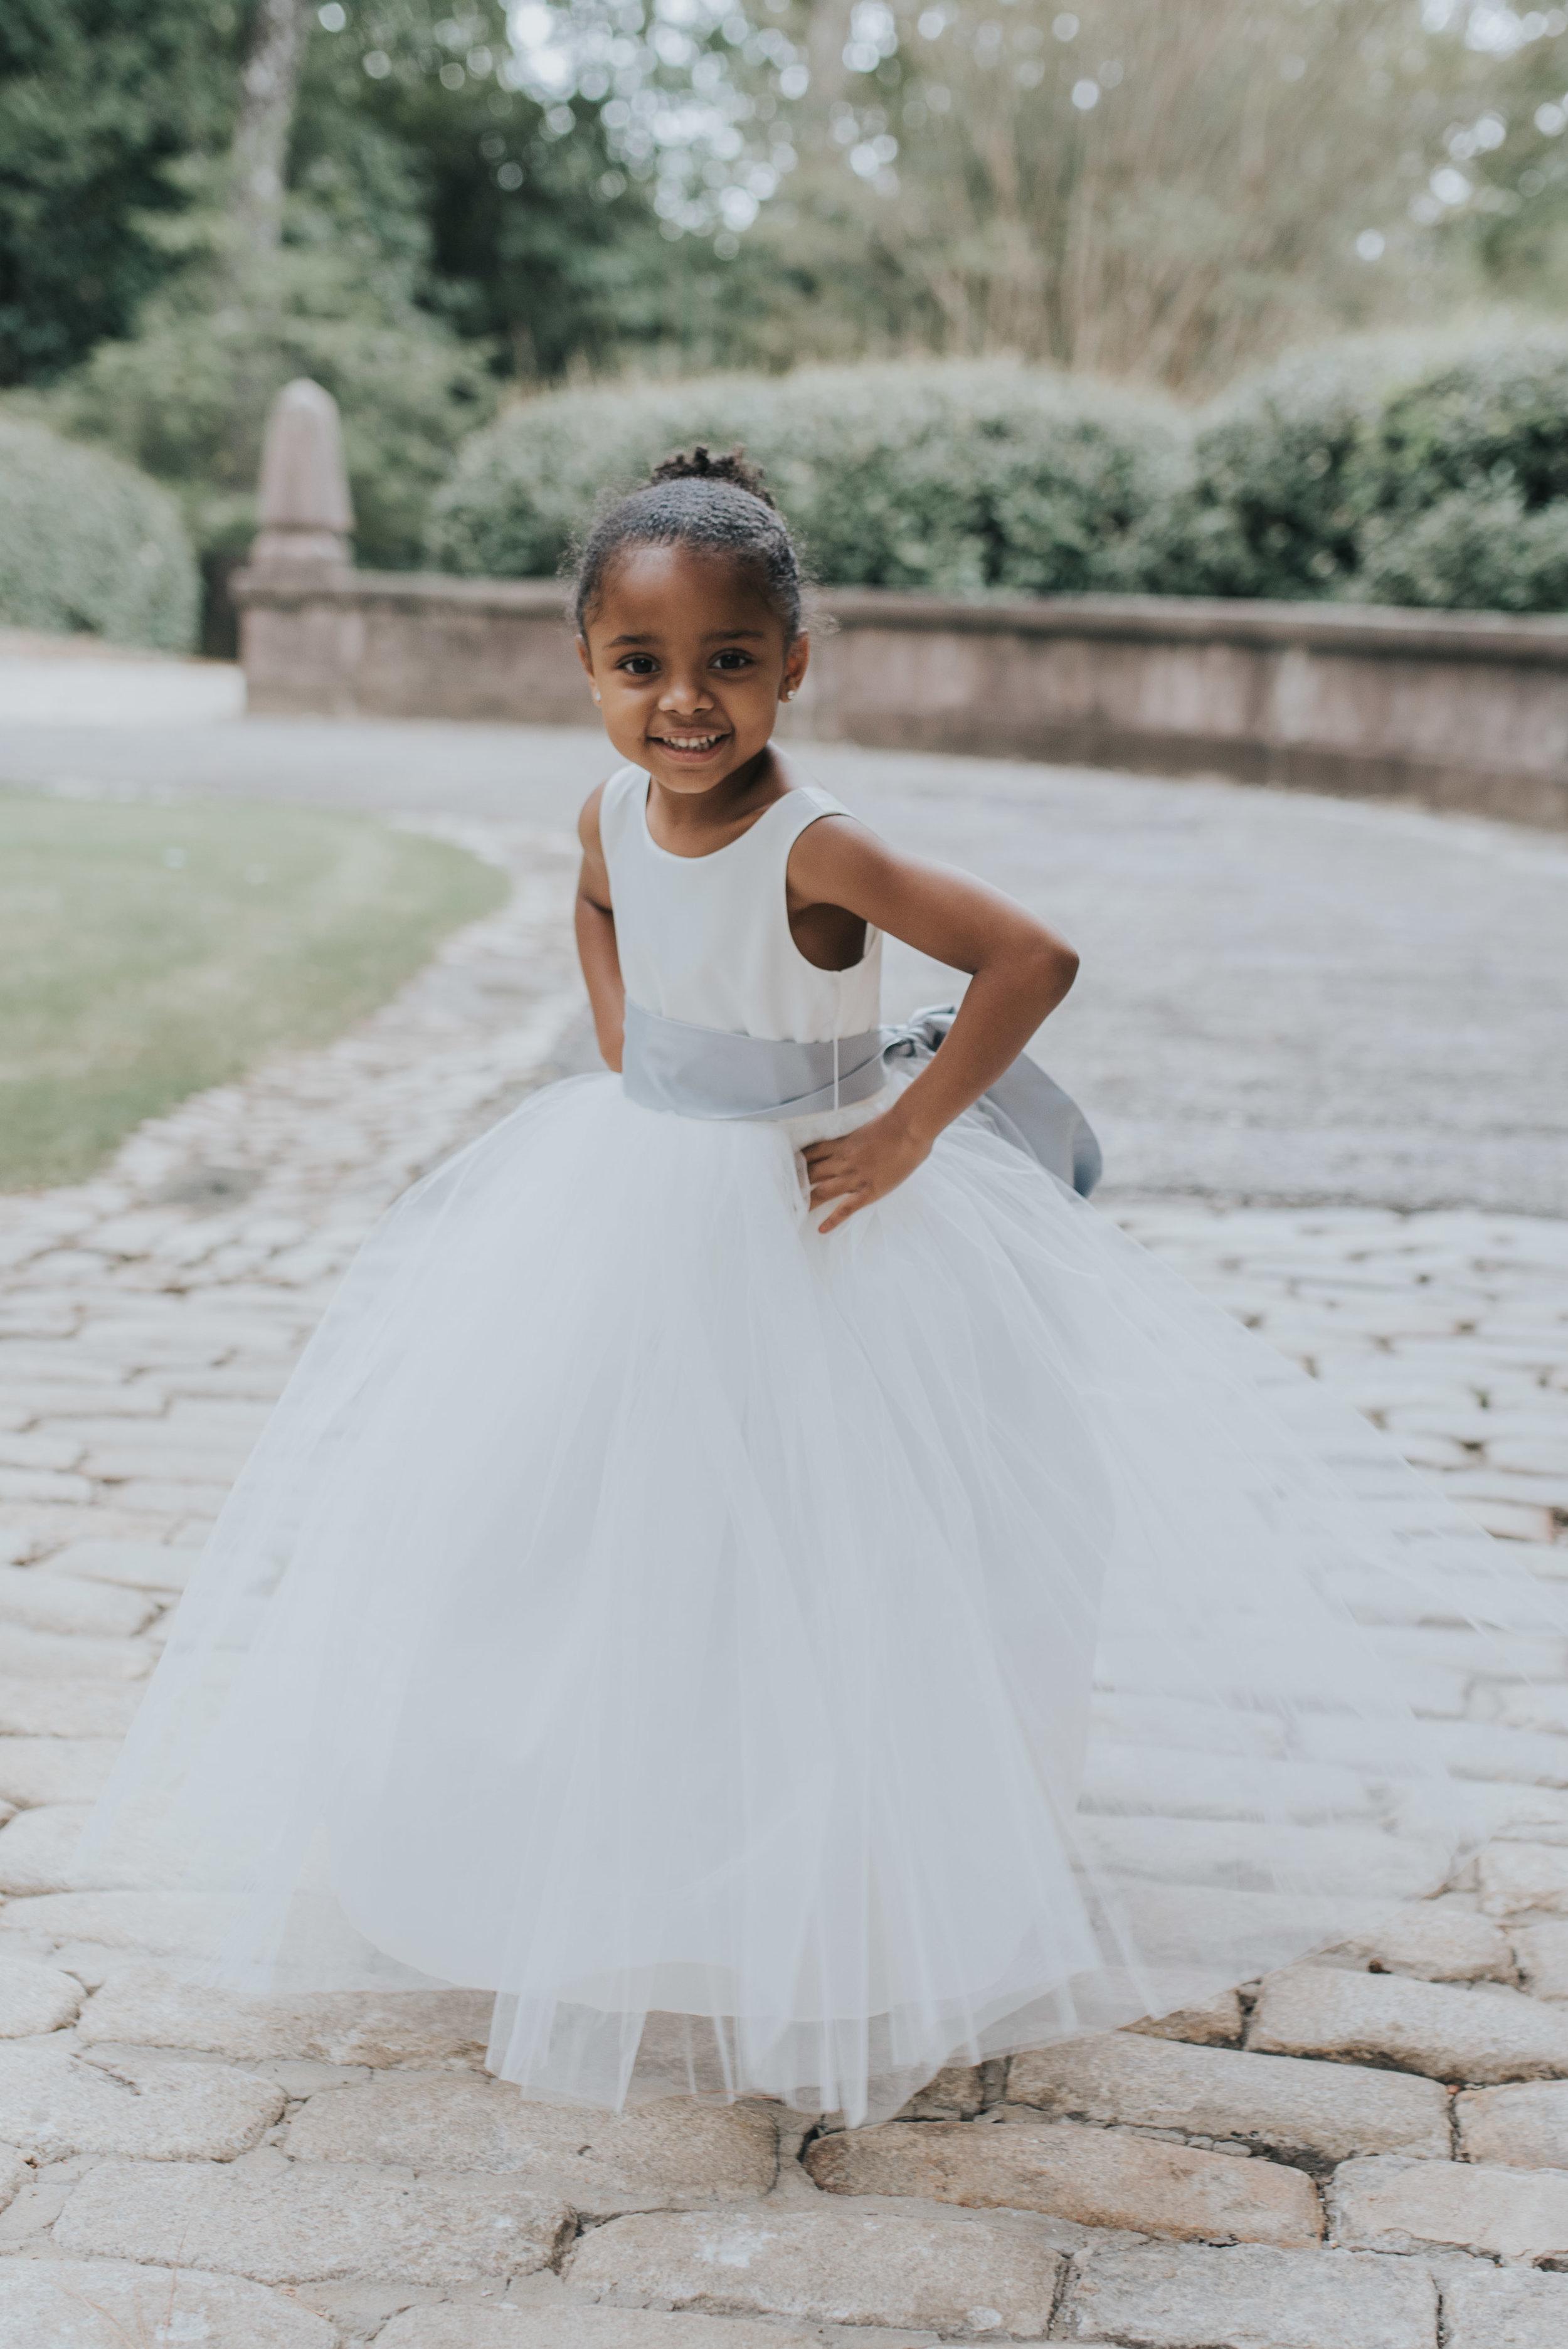 Flower girl posing before wedding ceremony at Swan House in Atlanta, GA